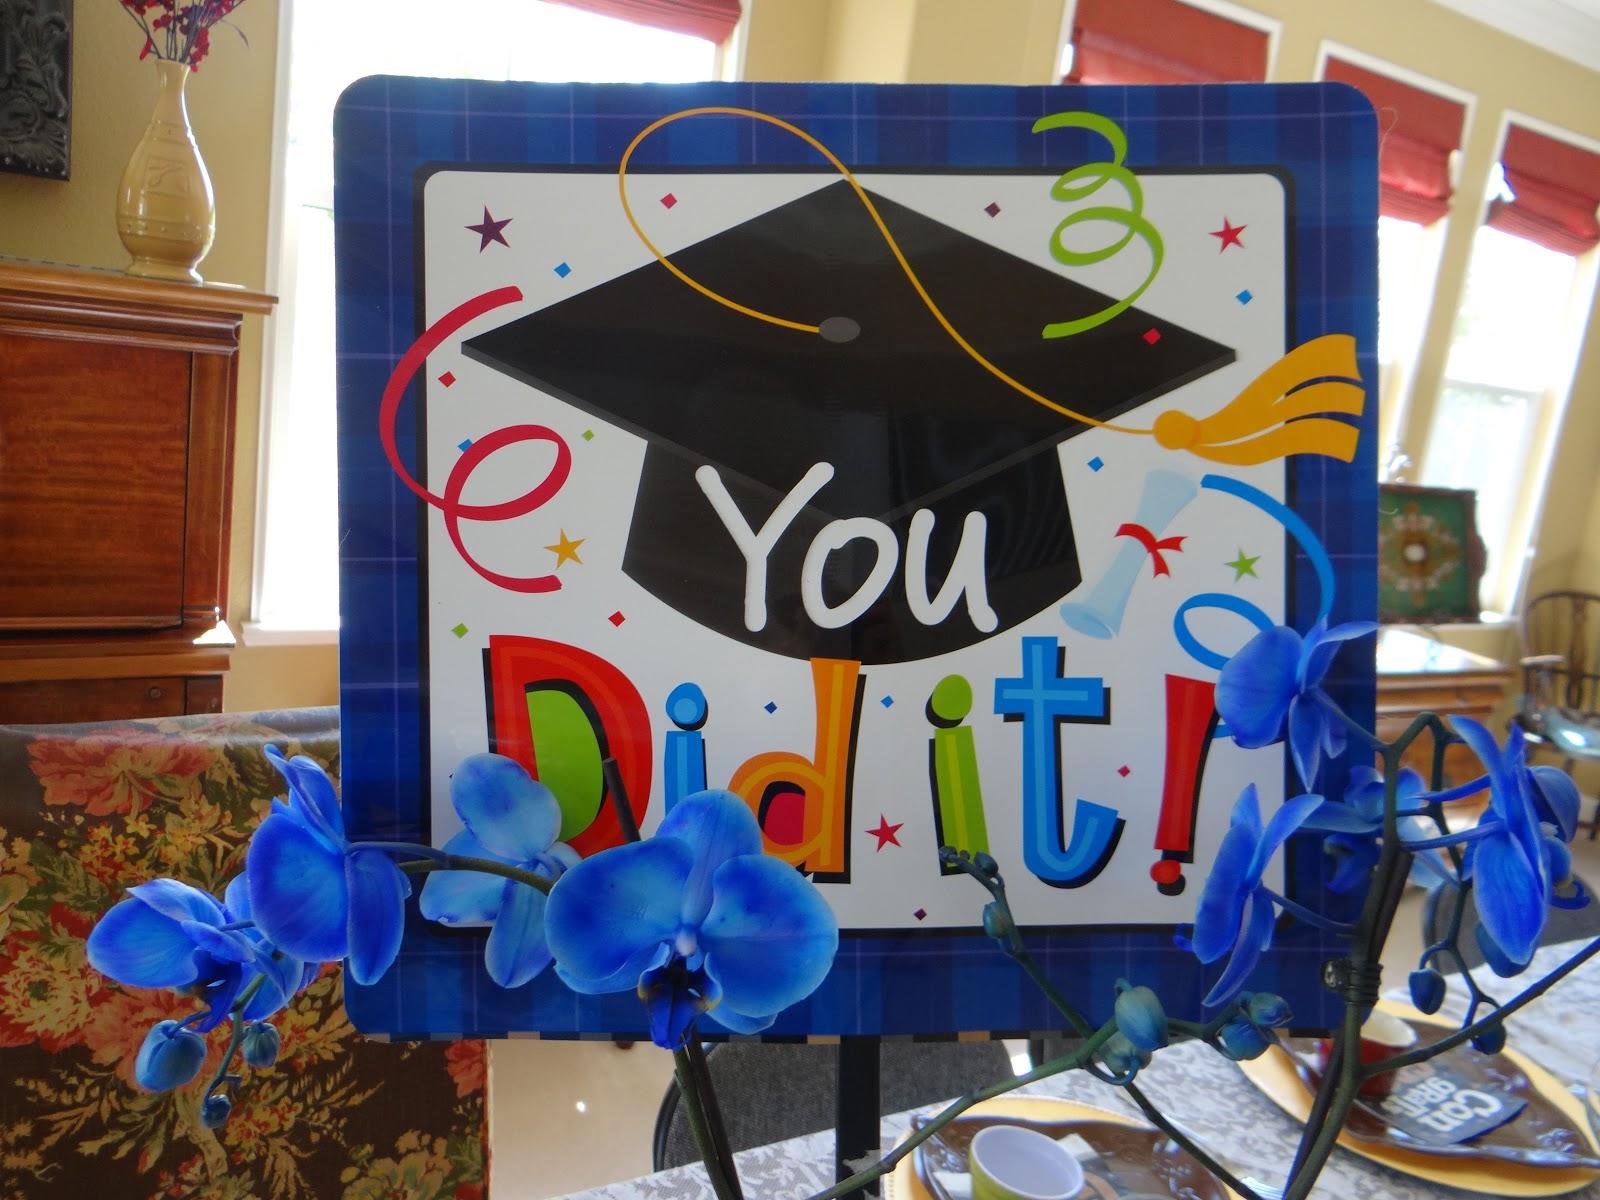 8th grade graduation table decoration ideas photograph fle for 8th grade graduation decoration ideas